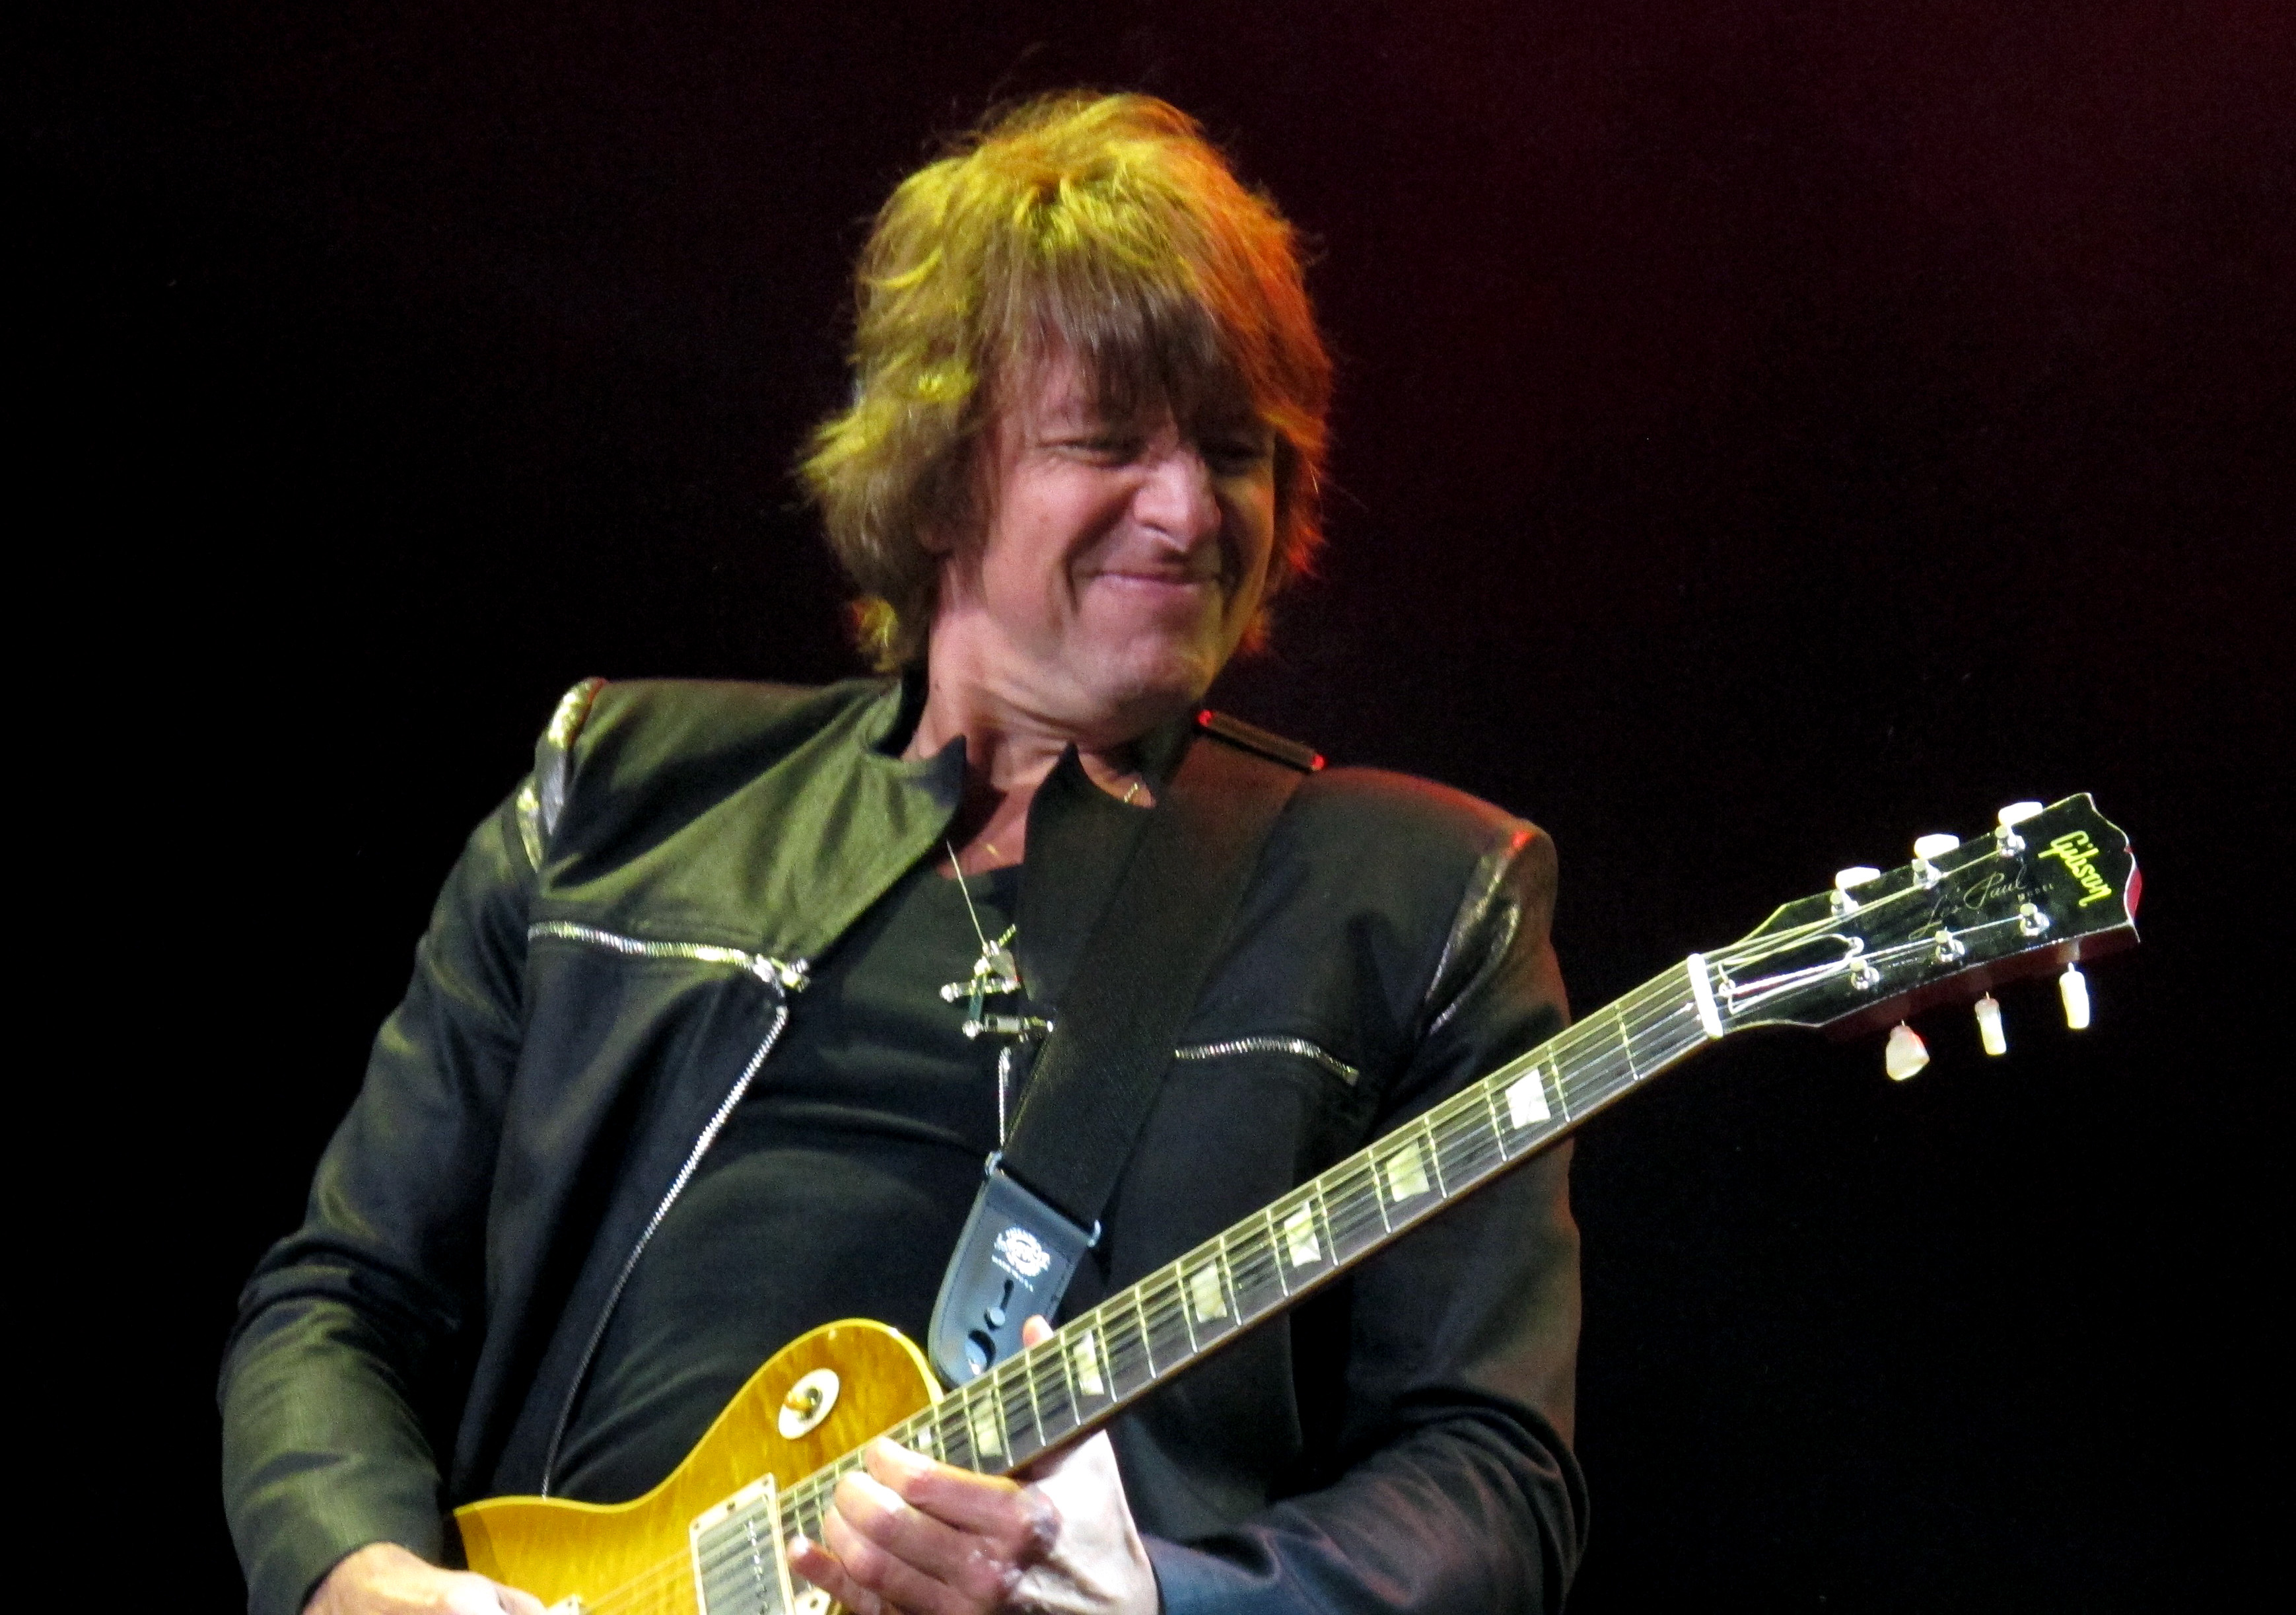 Richie Sambora quits Bon Jovi tour for 'personal issues'